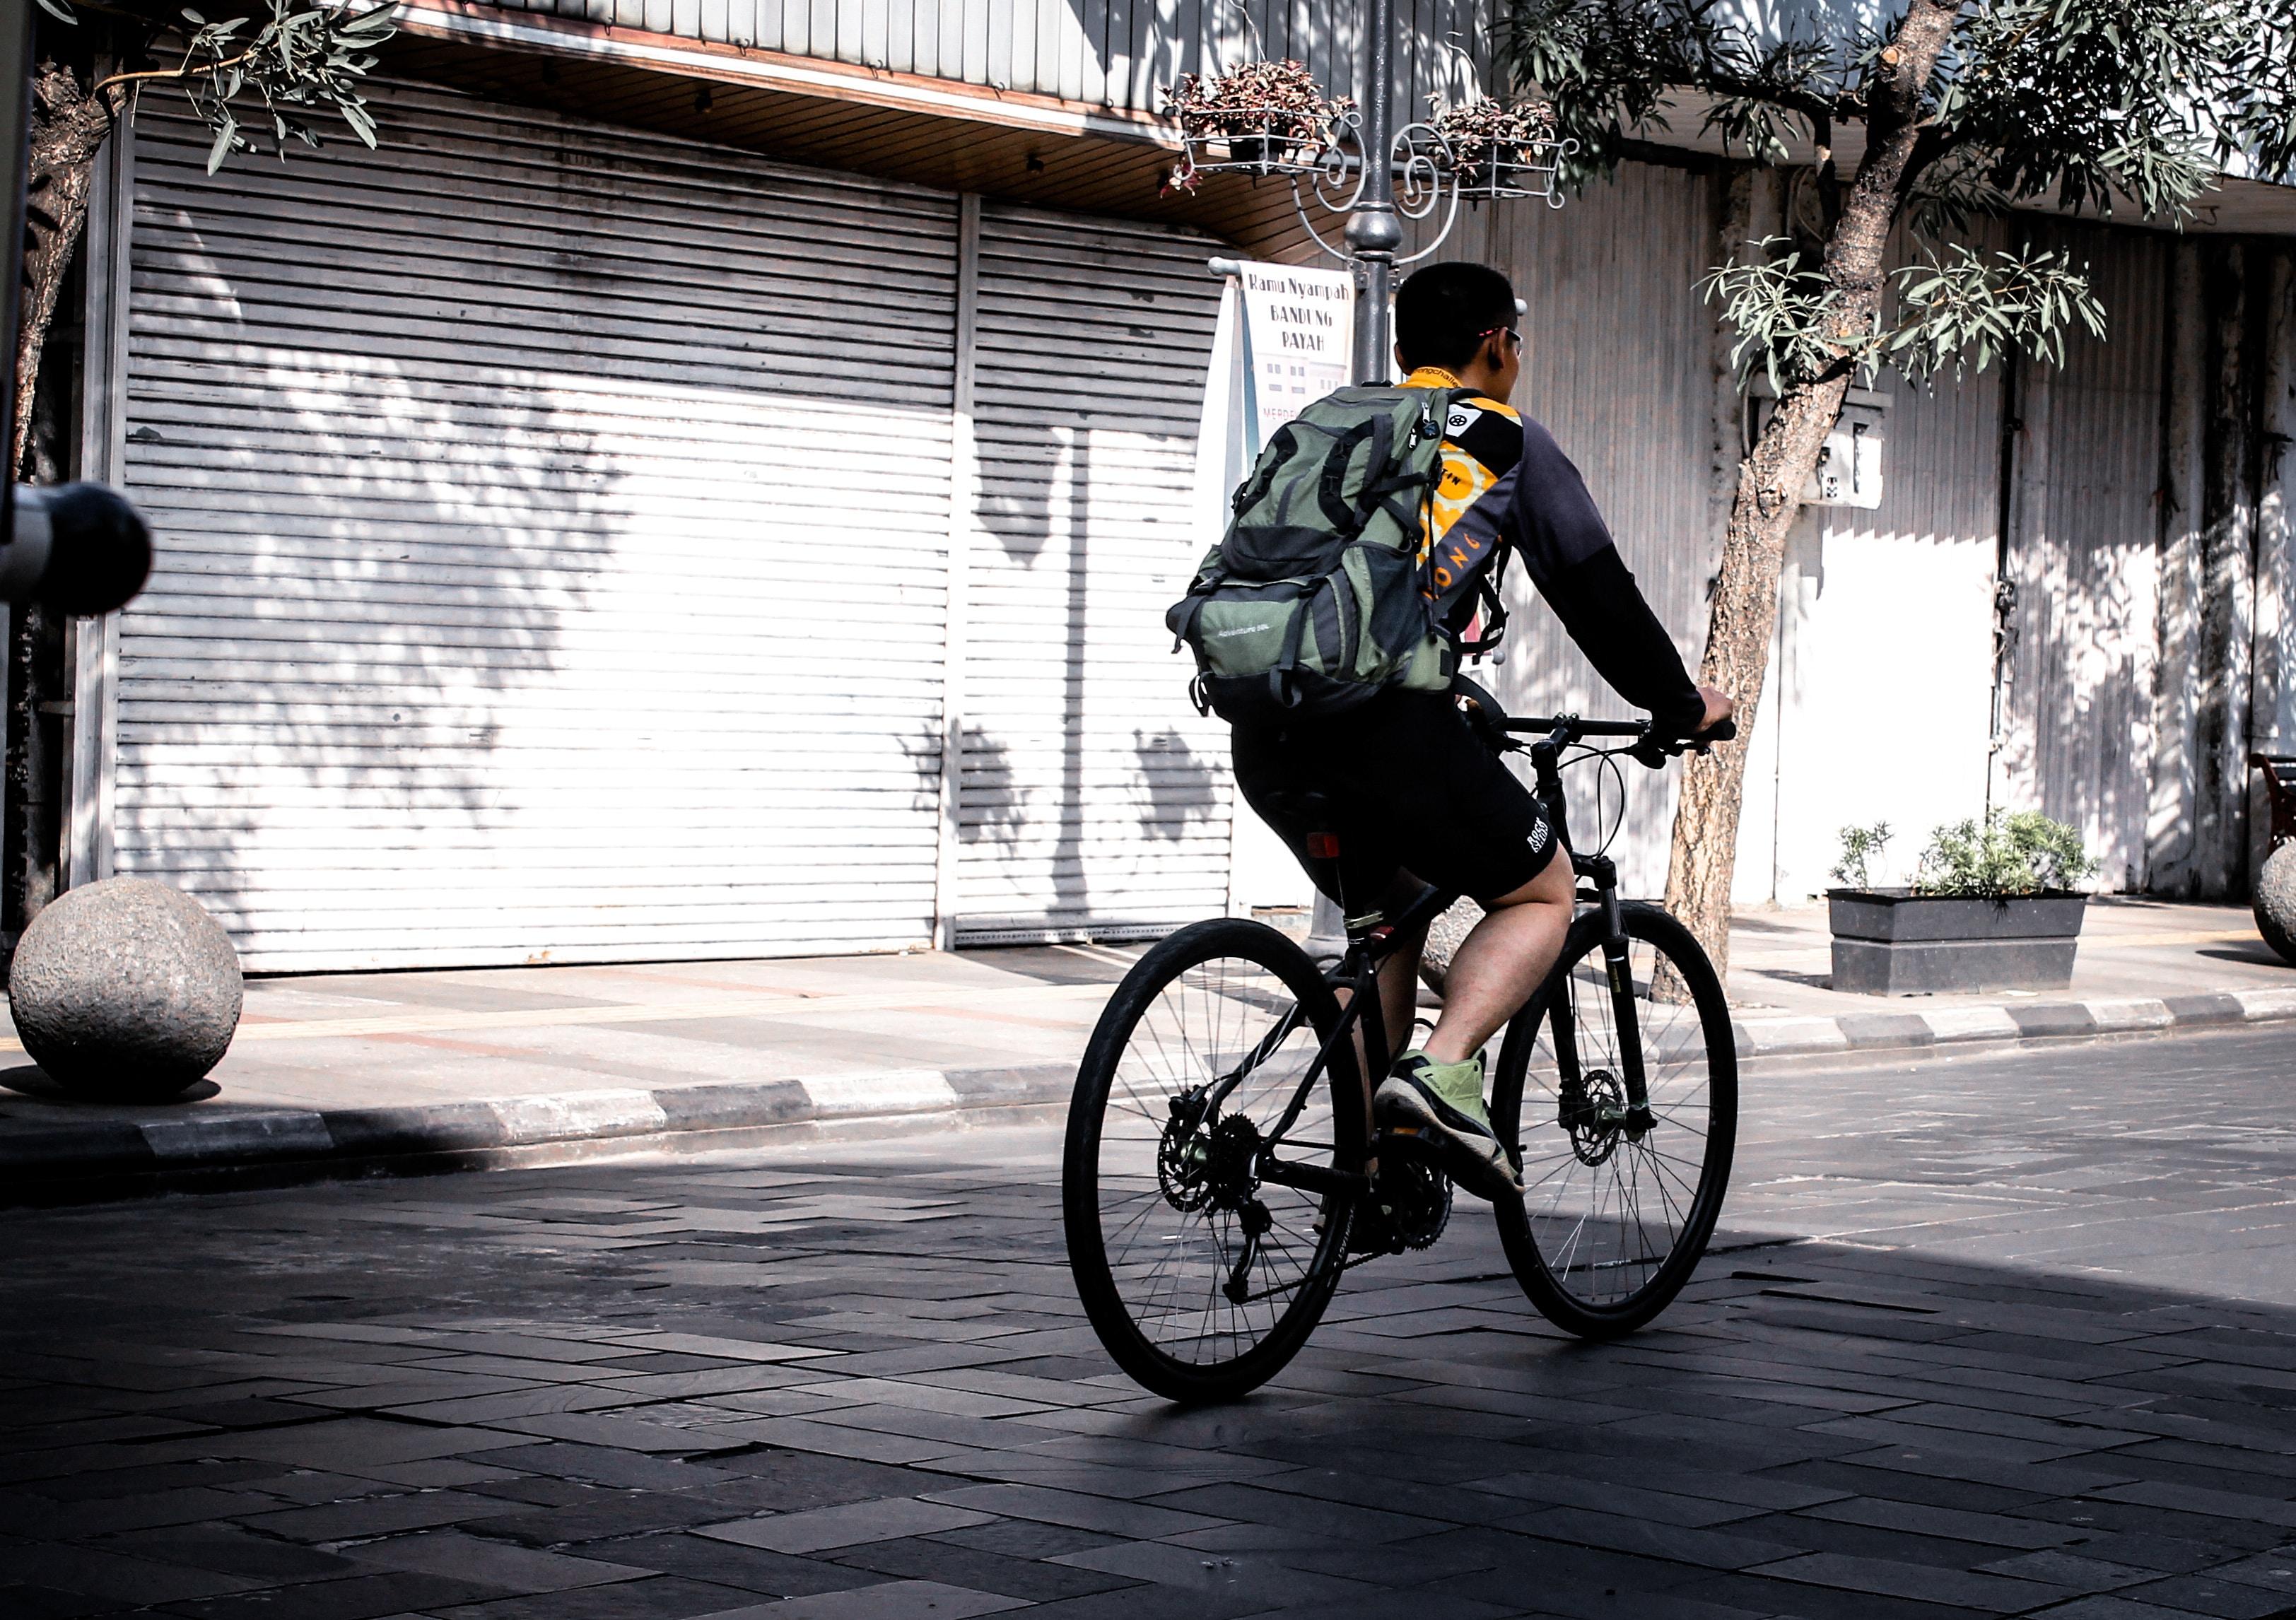 man riding bicycle near shutter roller